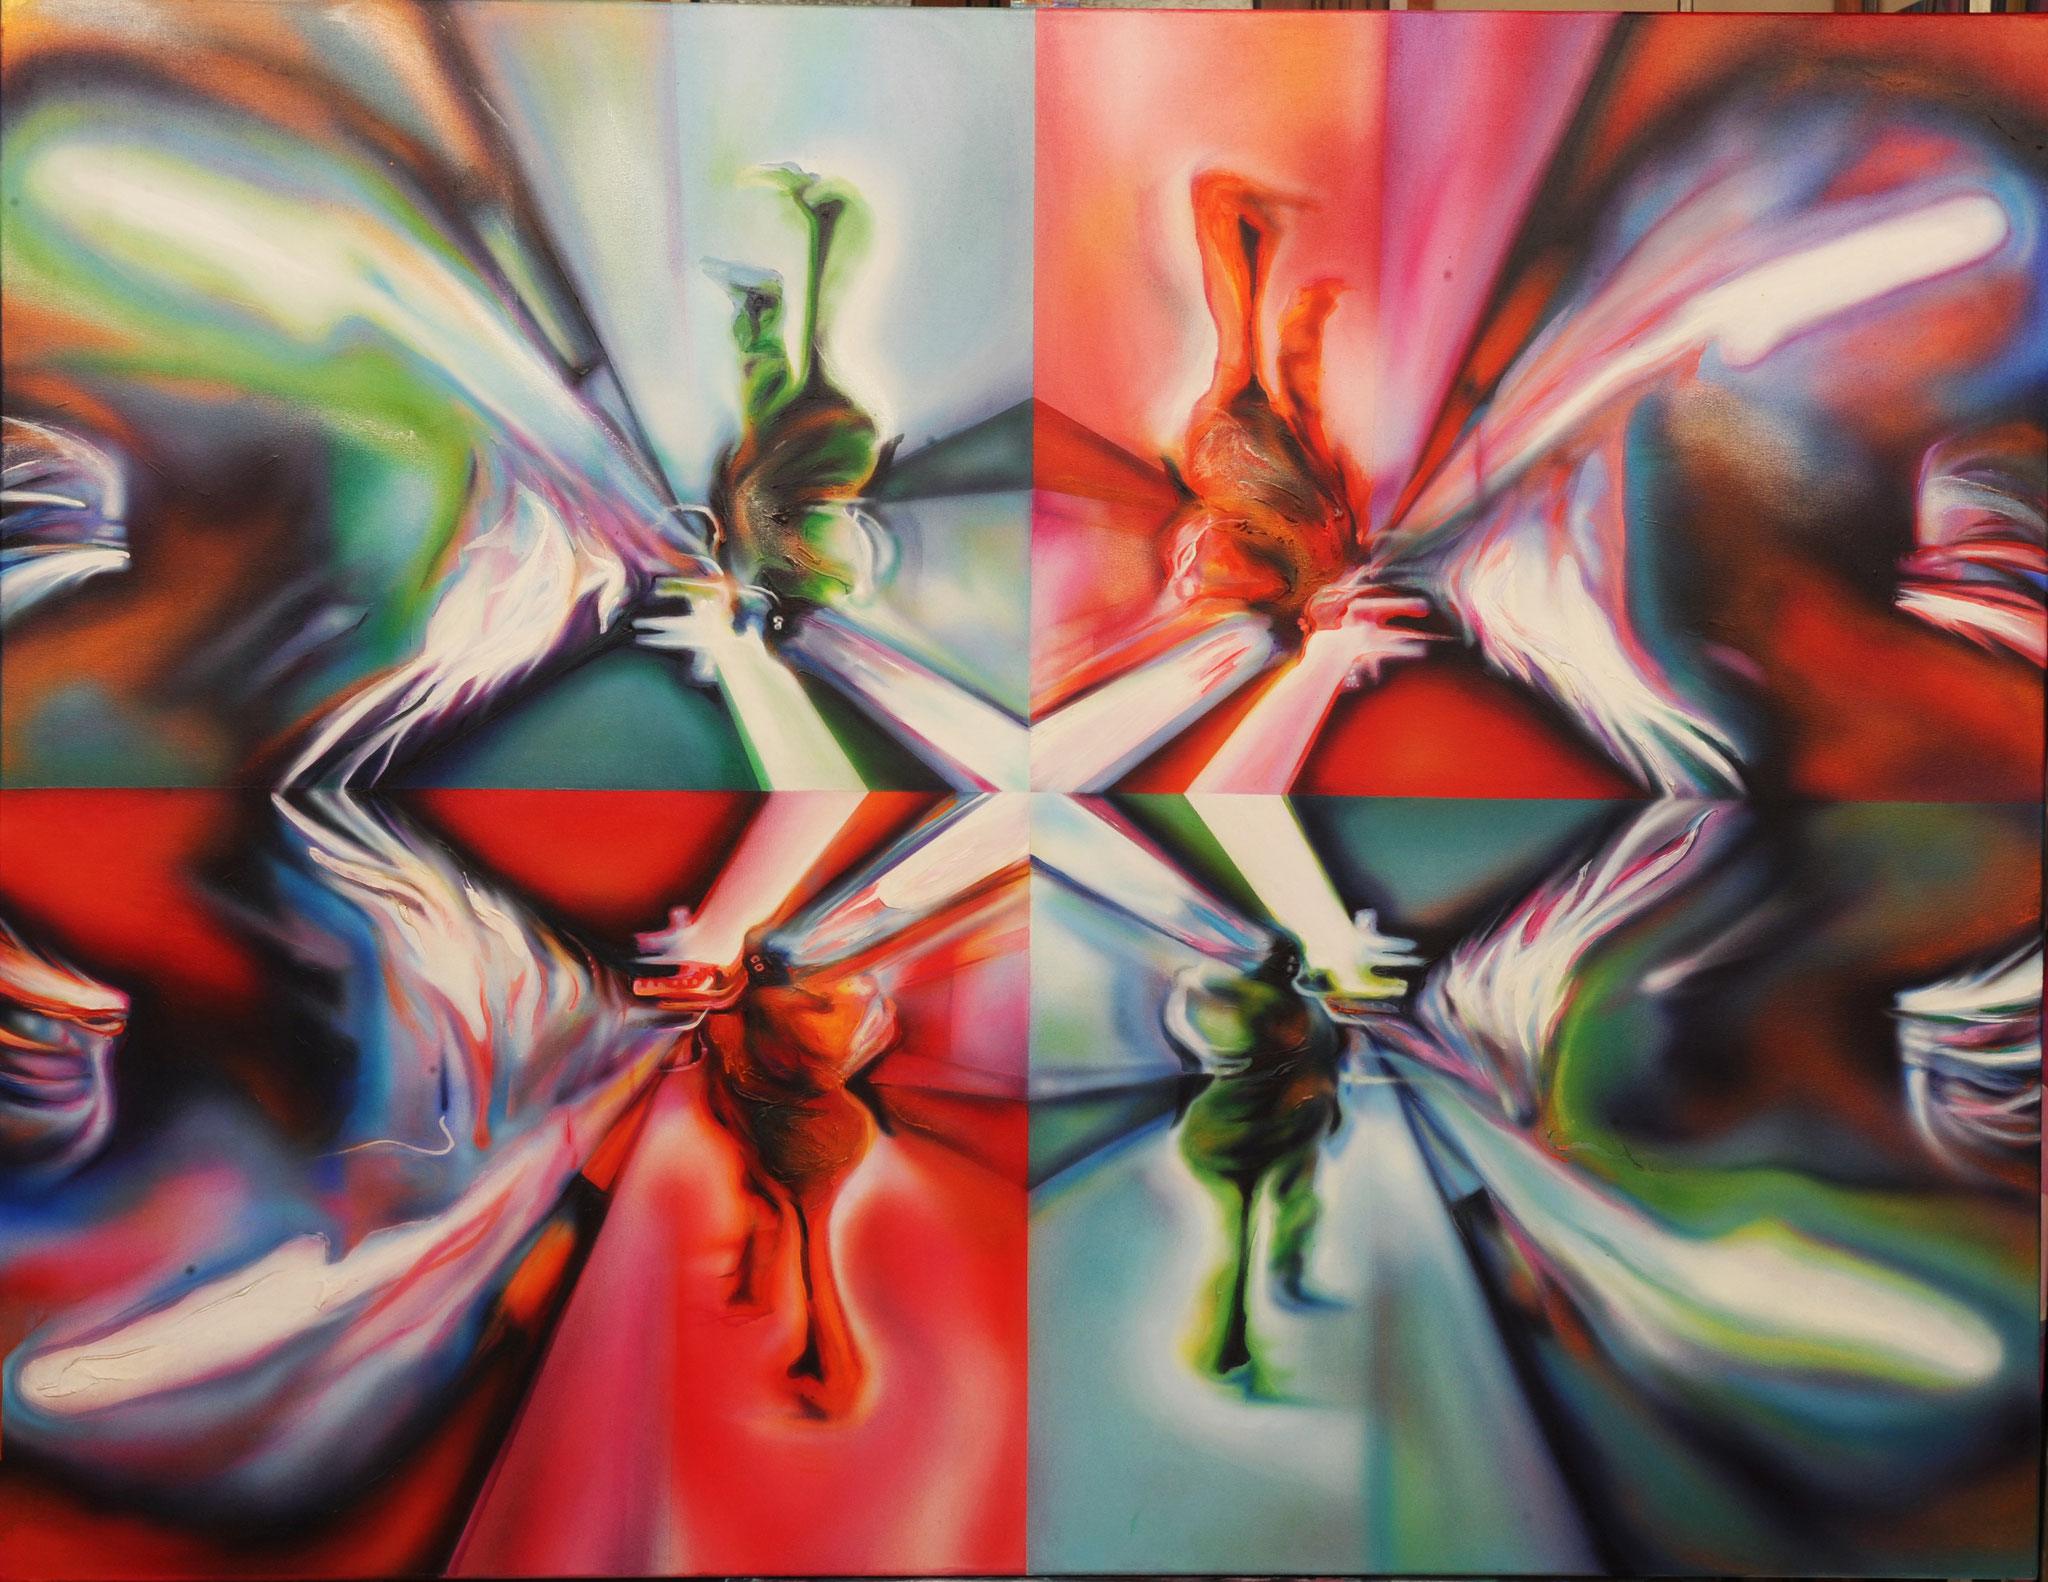 Caloido Rojo y Verde 133 cm x 173 cm Acryl auf Leinwand 2011